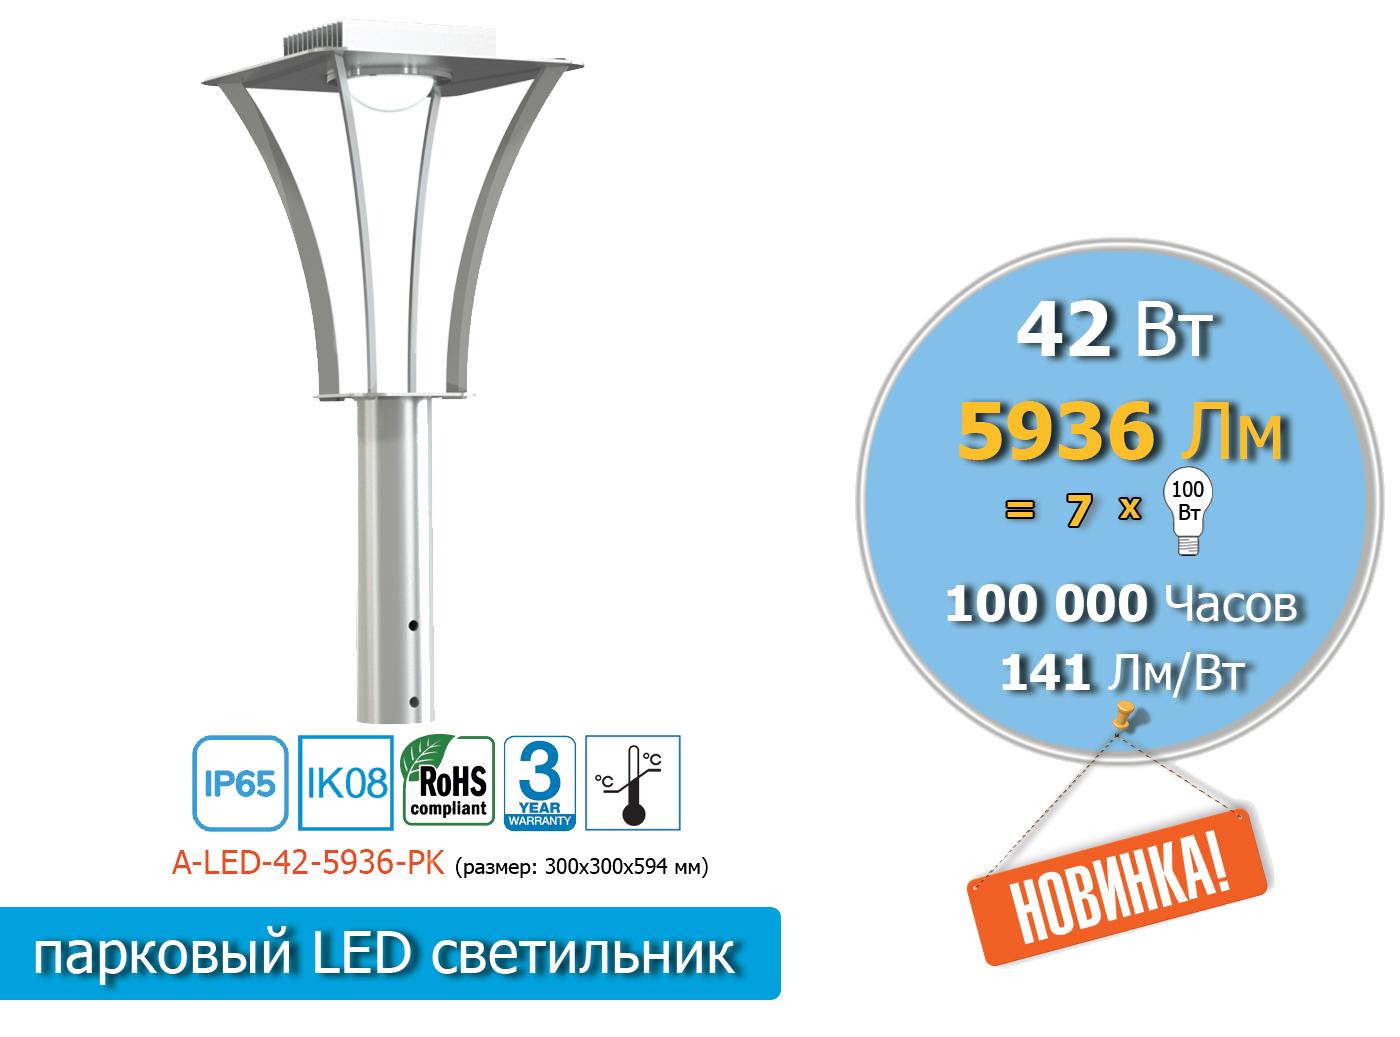 A-LED-42-5936-PK